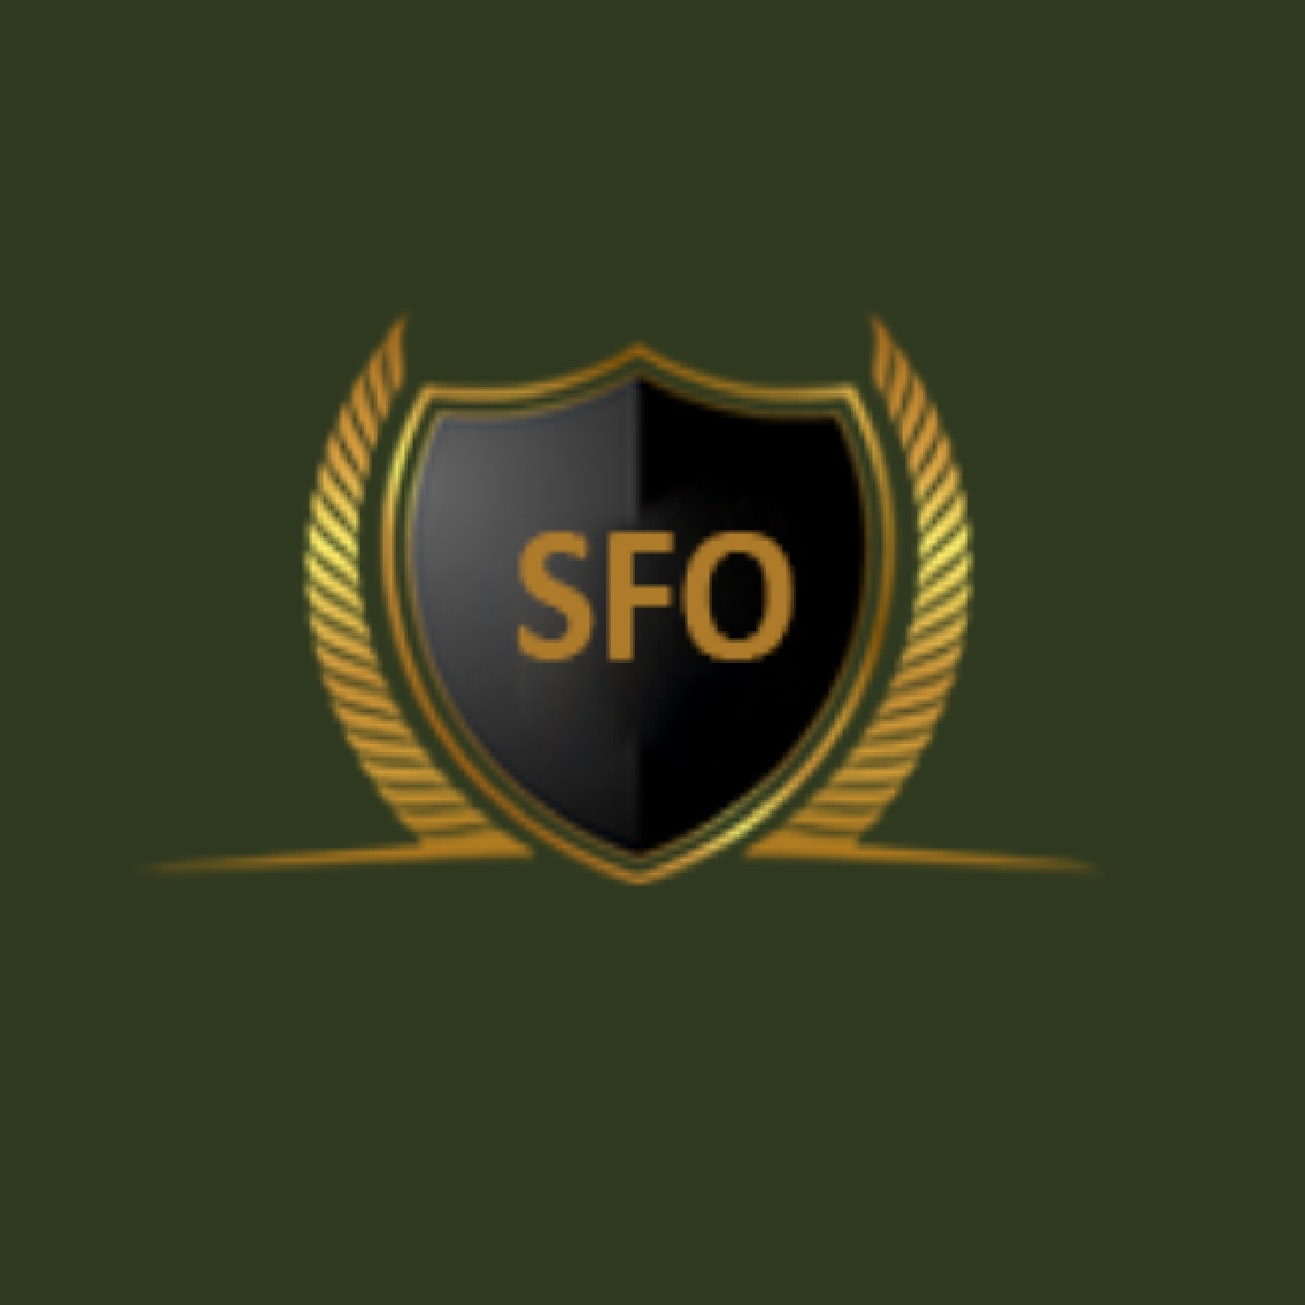 SFO Limo Airport logo